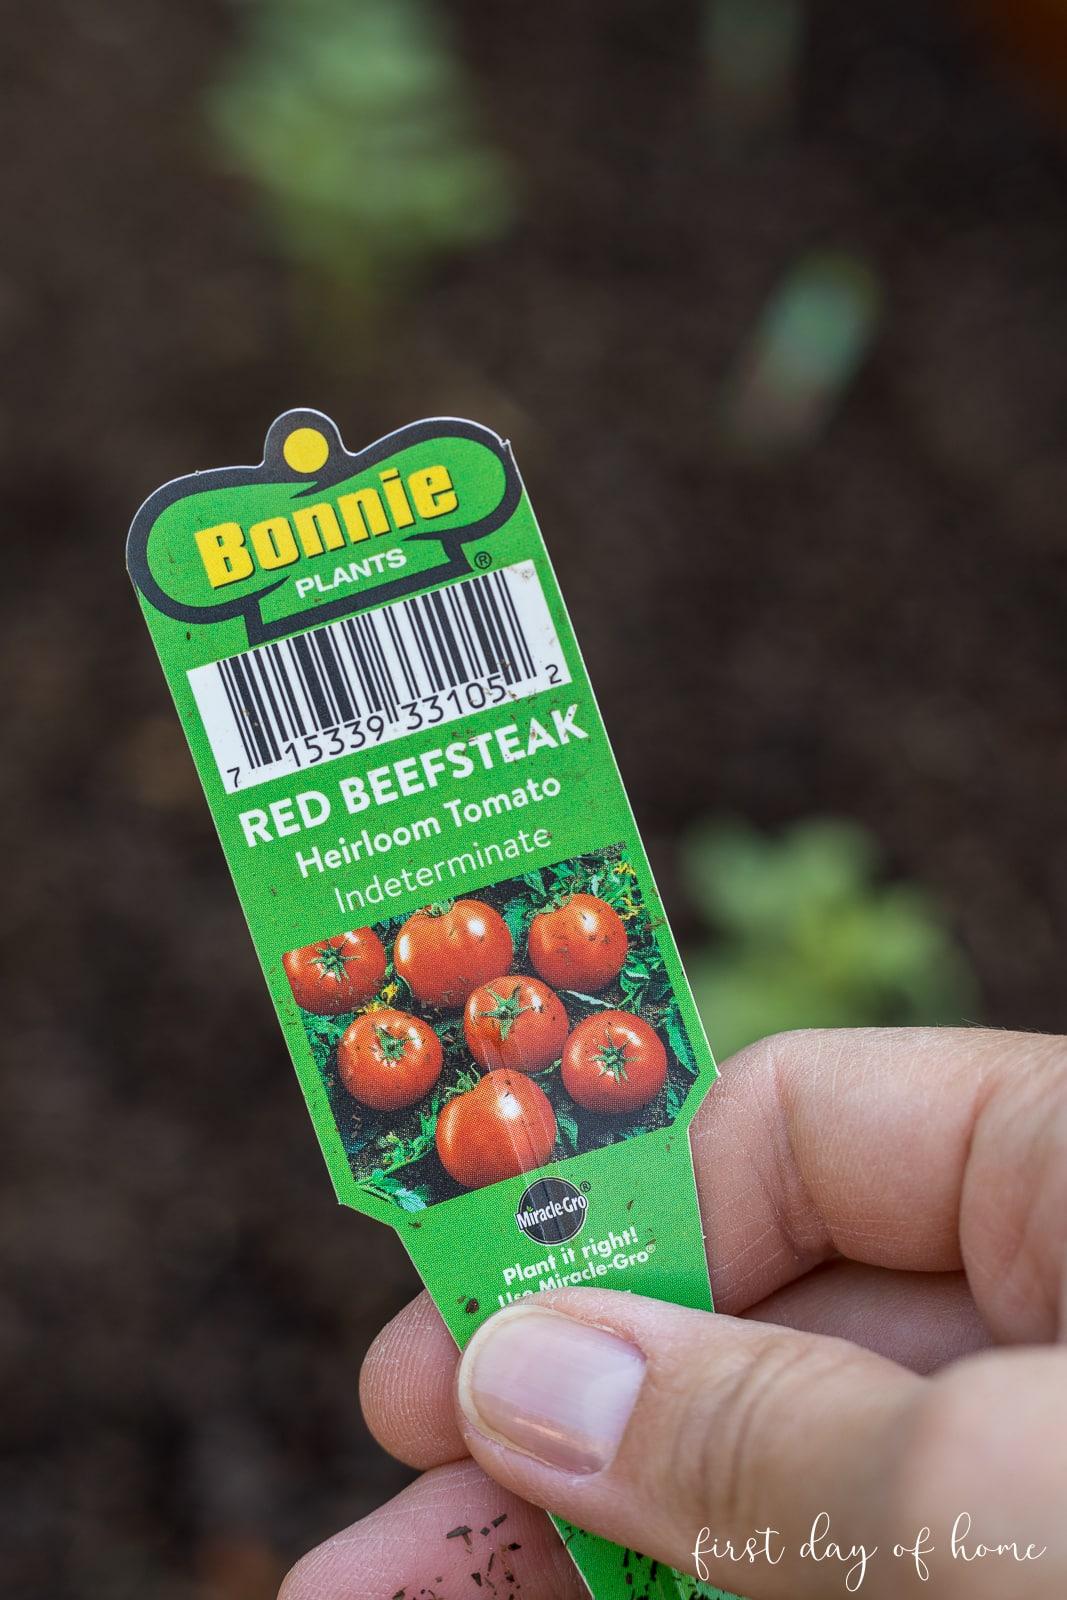 Beefsteak tomato plant information card